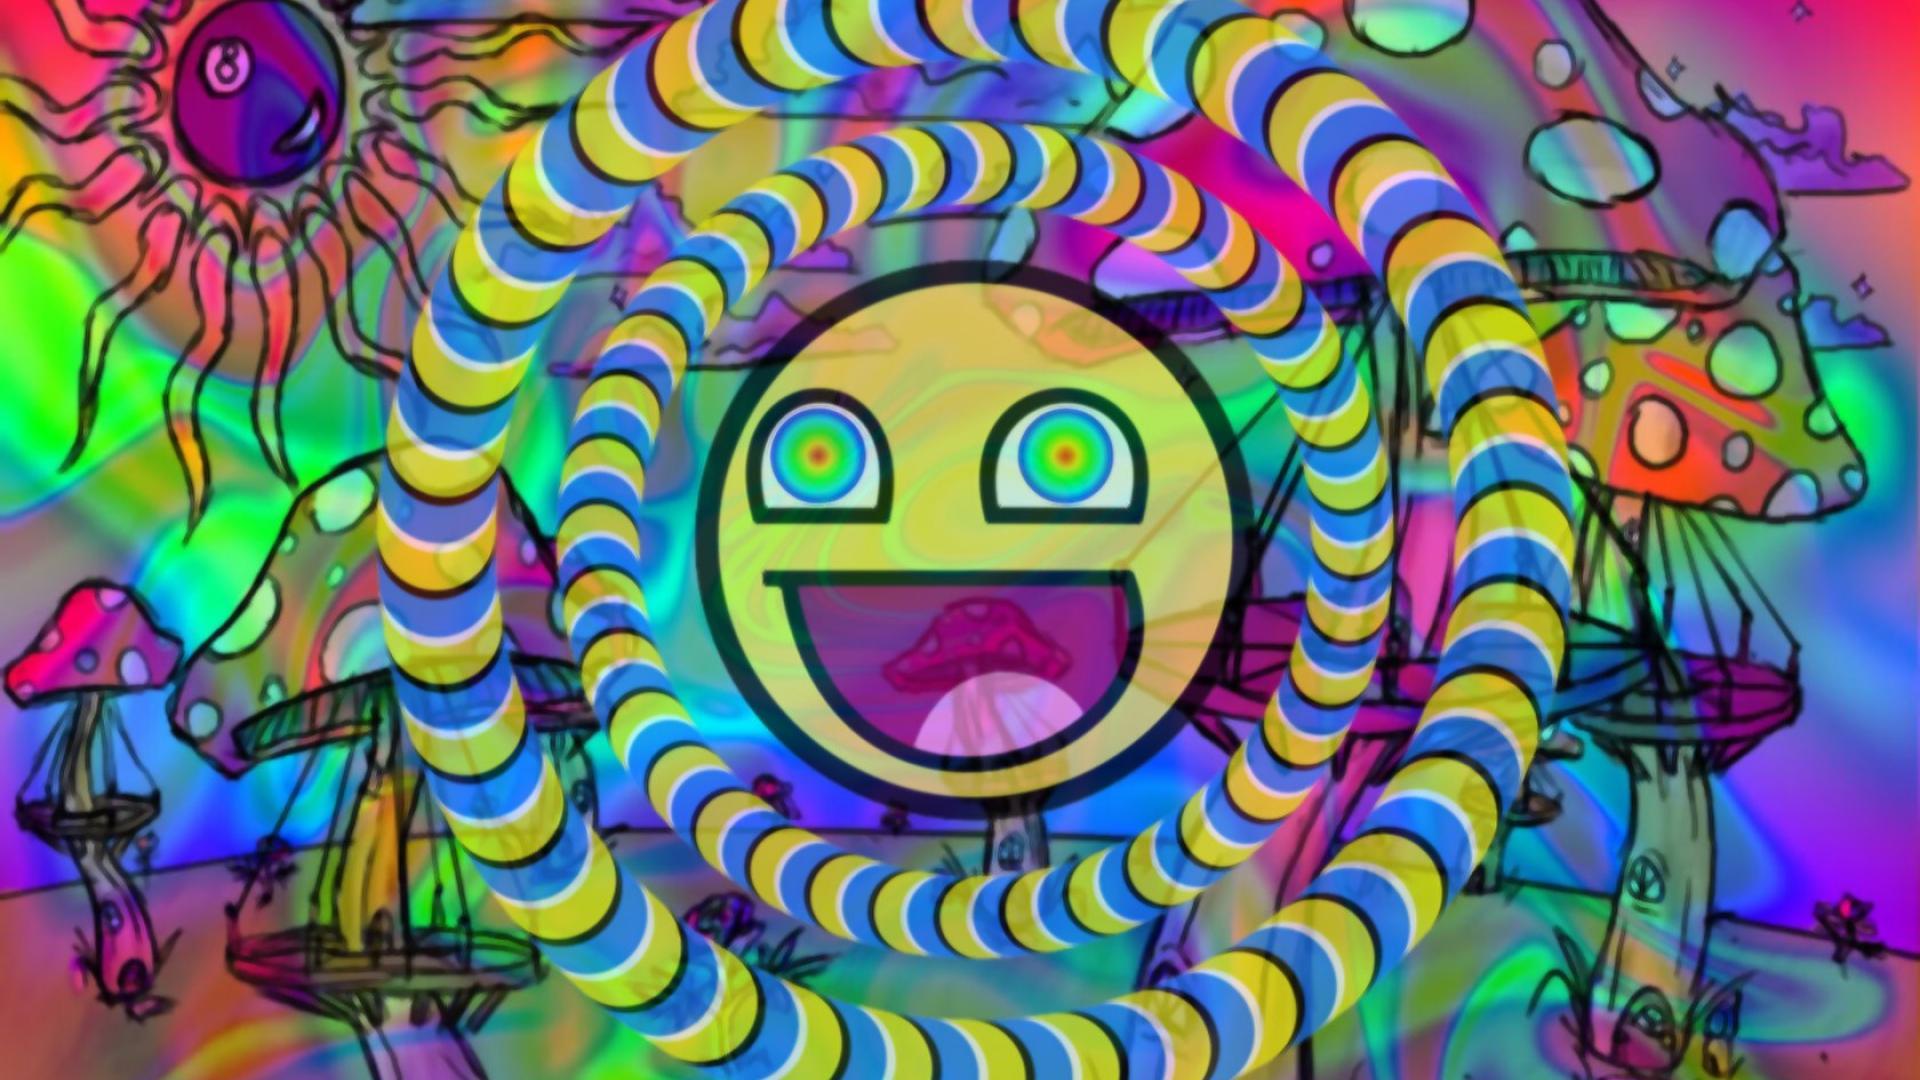 Psychedelic Wallpaper Emoji